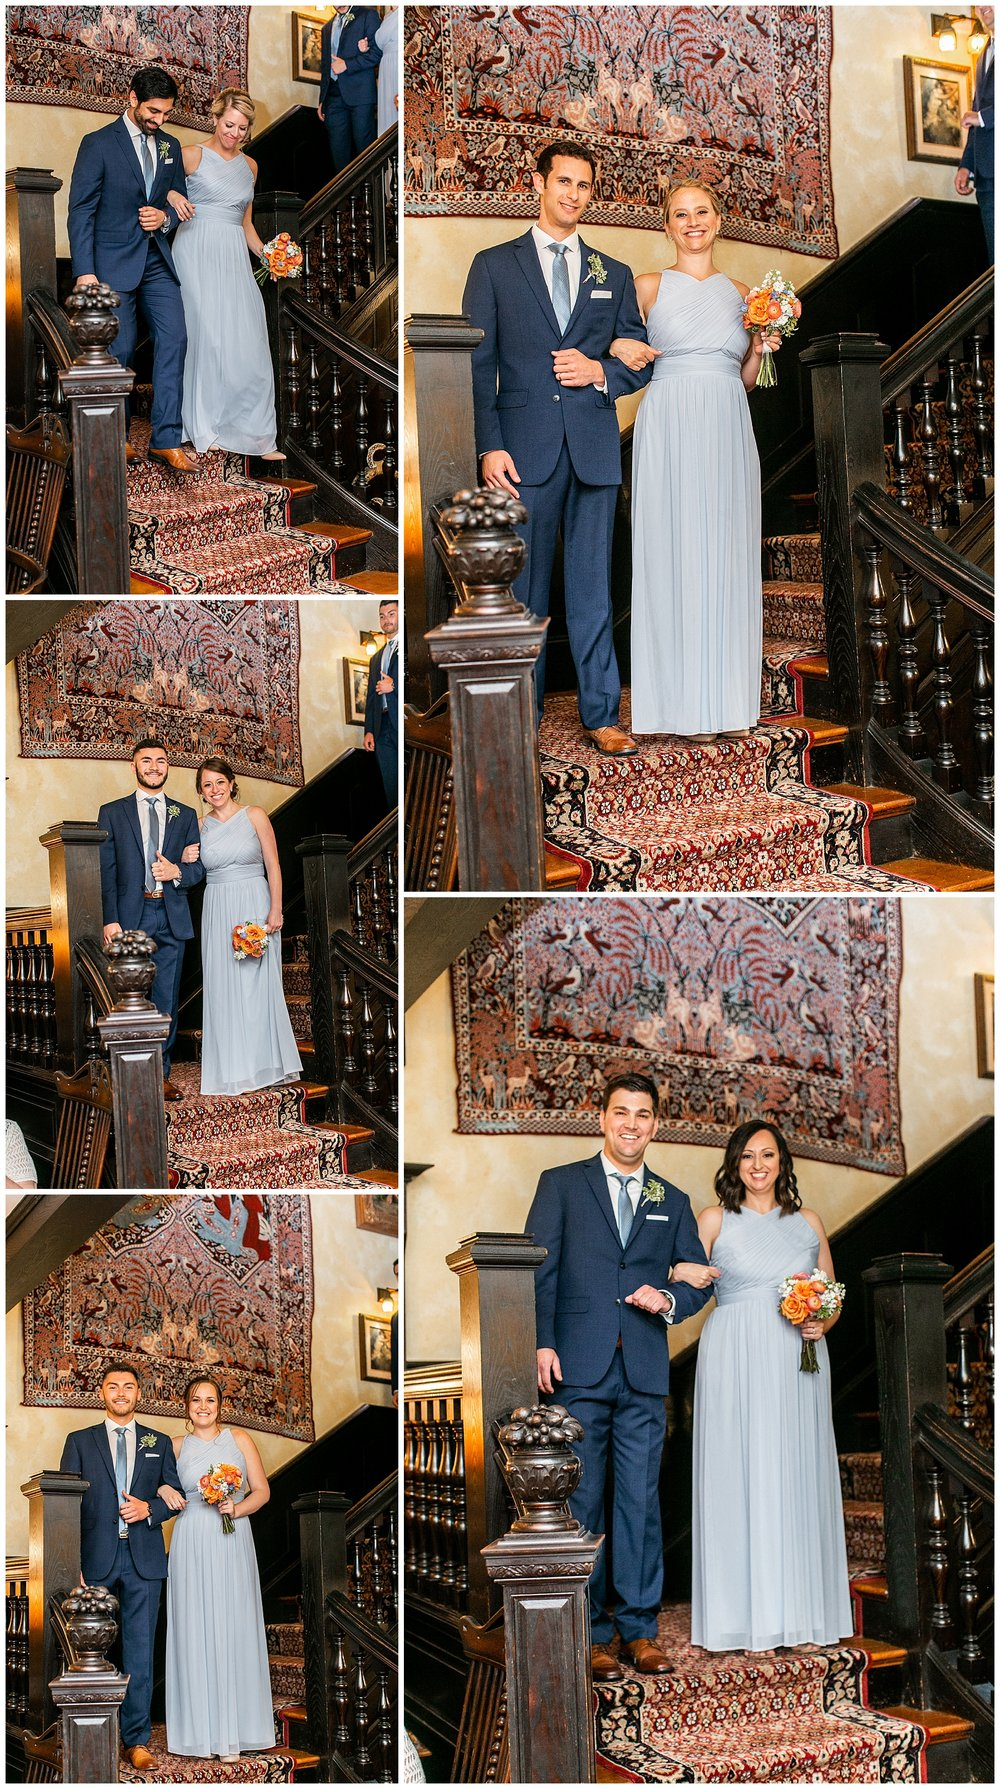 Ashley + Kevin Gramercy Mansion Rainy Day Baltimore Wedding Living Radiant Photography photos_0088.jpg